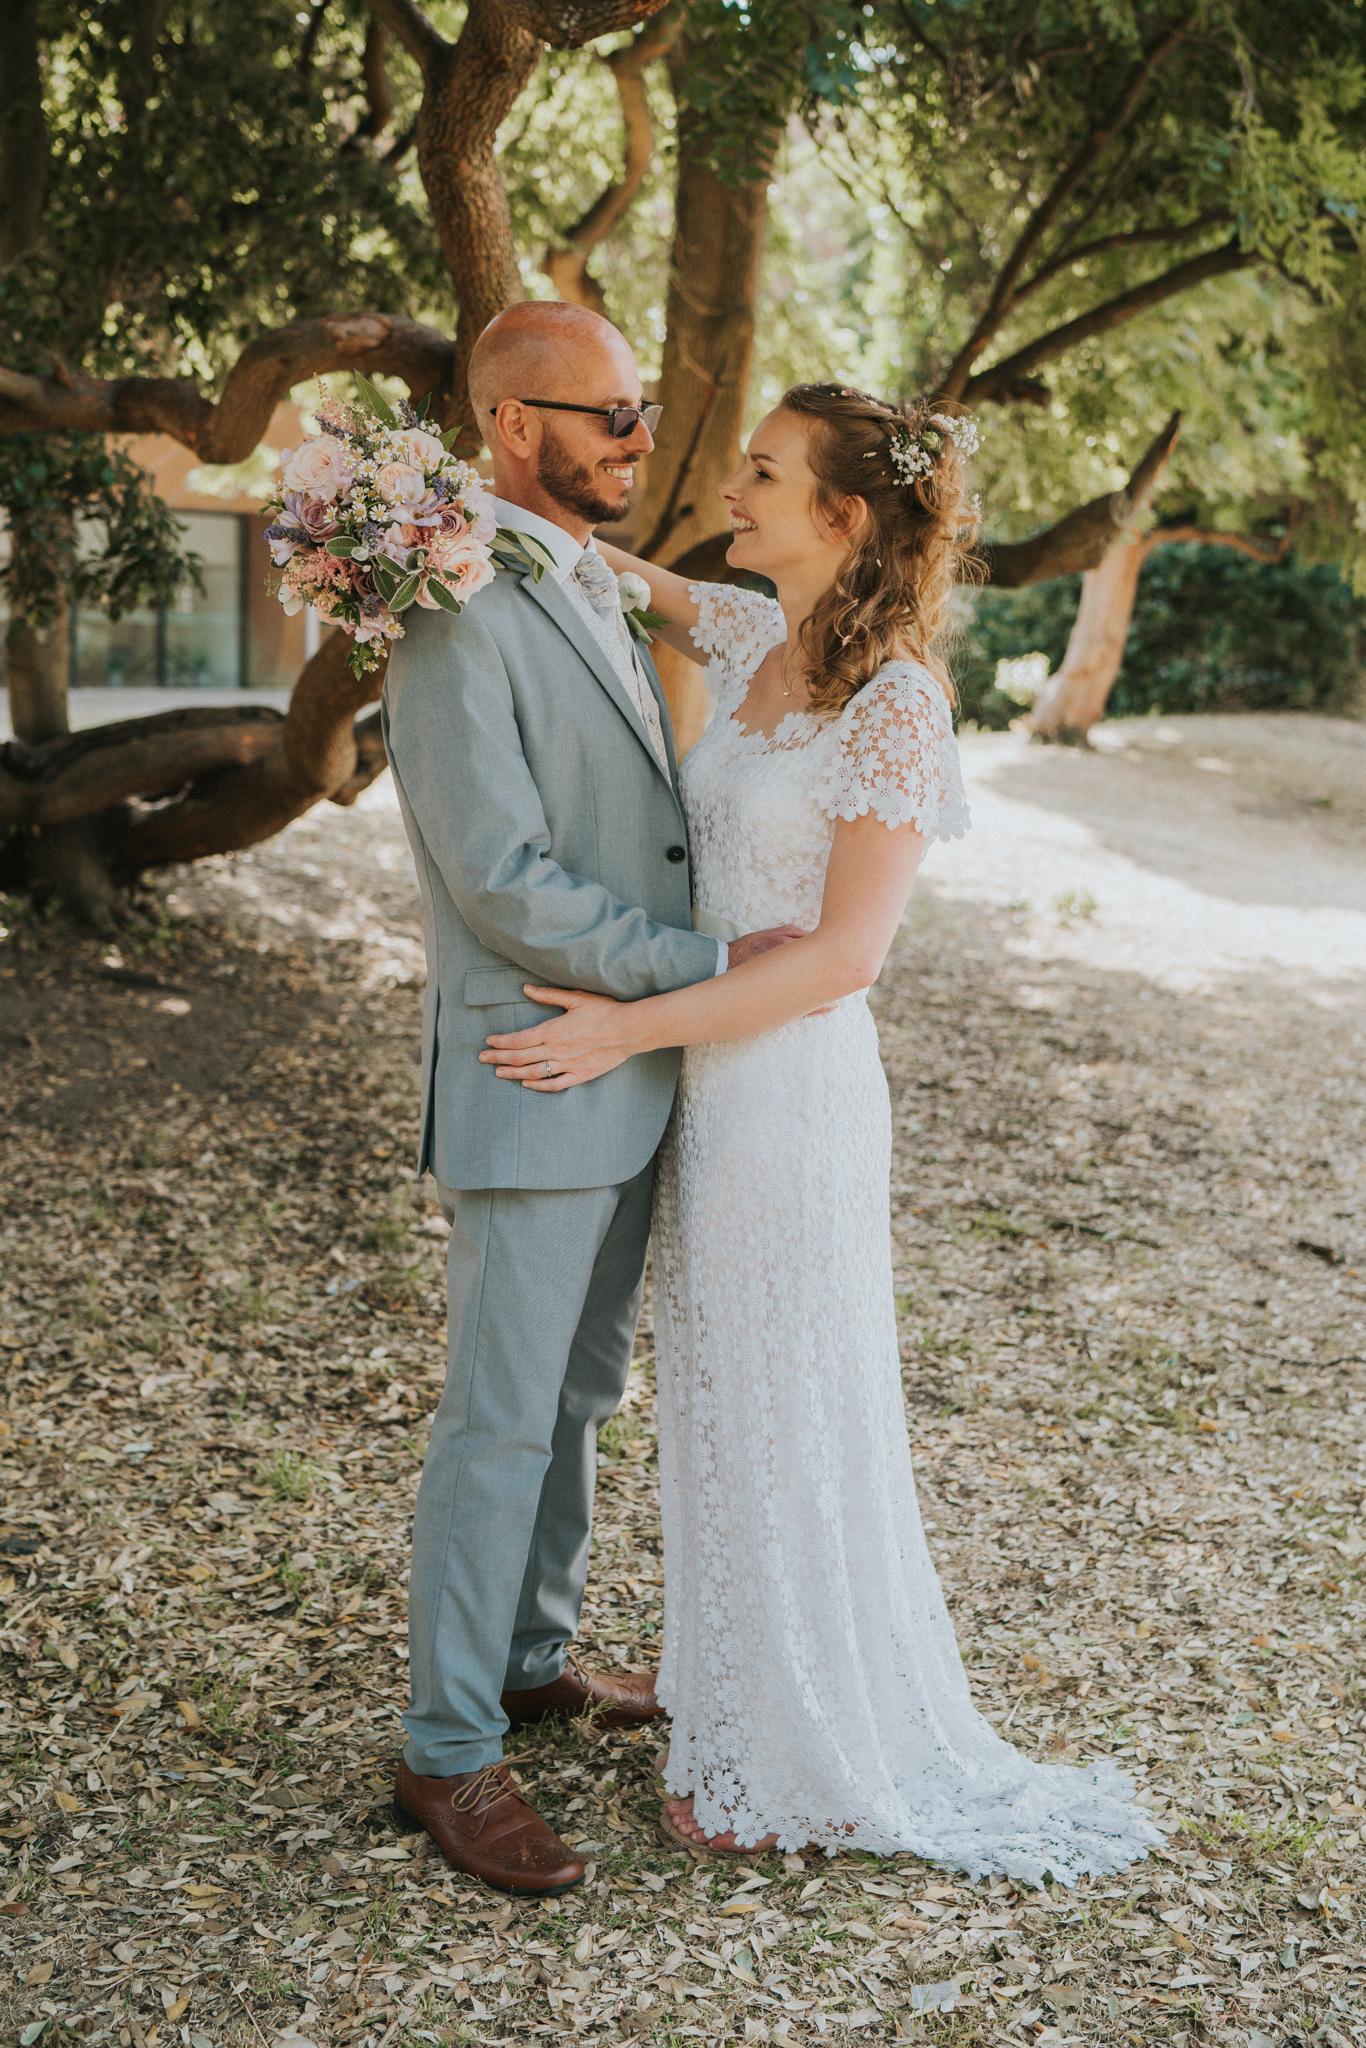 Grace-Elizabeth-Georgie-Amalaketu-Firstsite-Colchester-Essex-Boho-Buddhist-Wedding-Alternative-Wedding-Photography-Essex (83 of 100).jpg